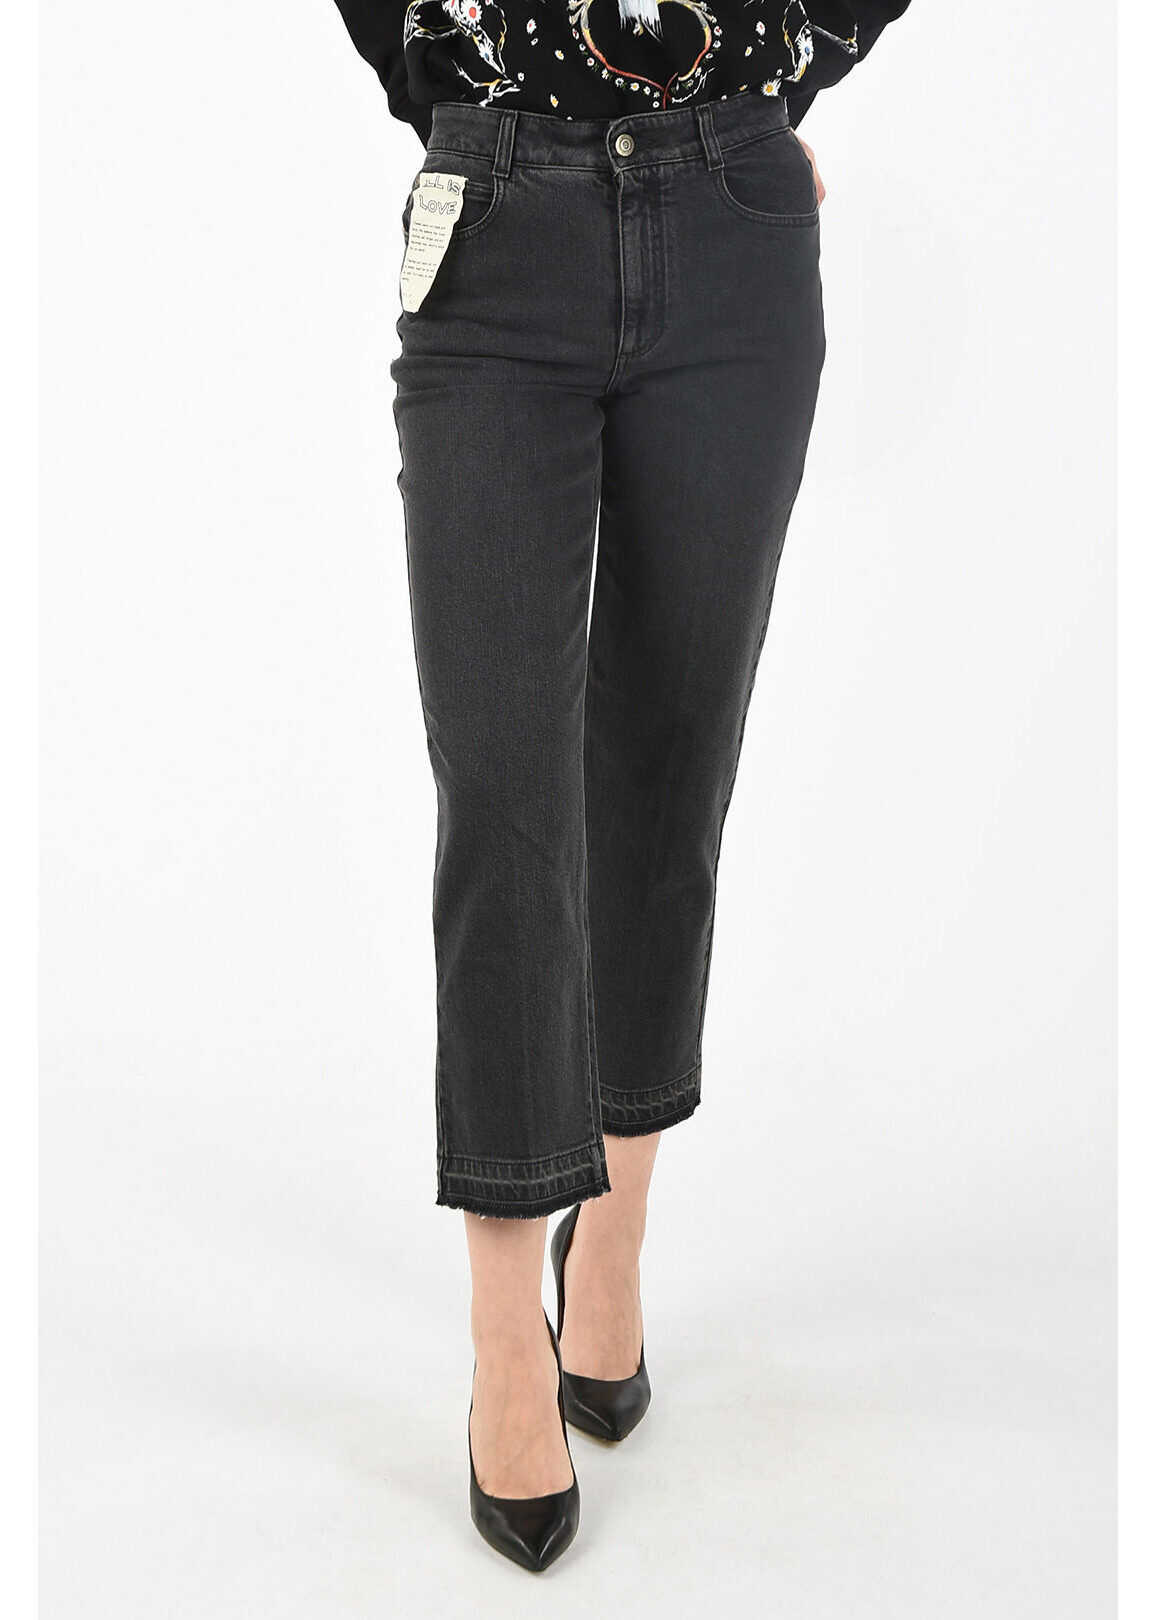 adidas by Stella McCartney regular fit jeans BLACK